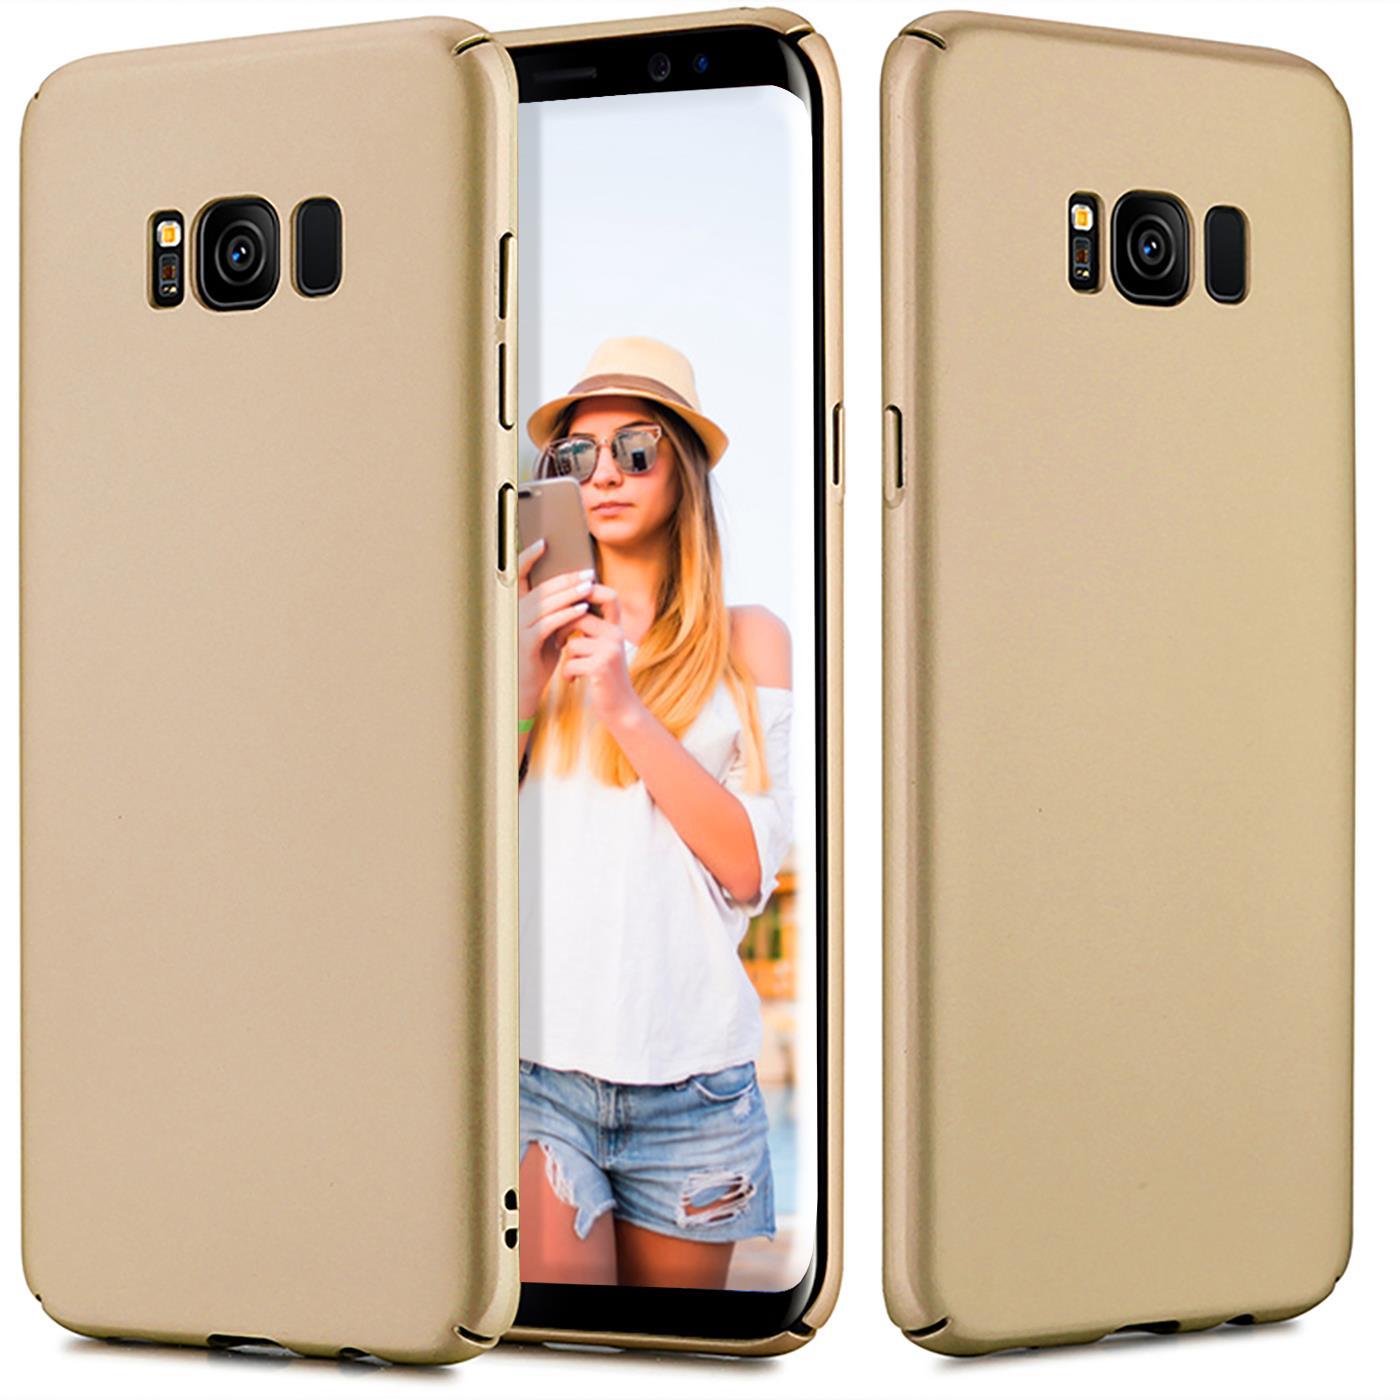 Hard-Back-Case-Cover-Samsung-Galaxy-s4-duenn-Cover-Slim-Shockproof-Rugged Indexbild 16